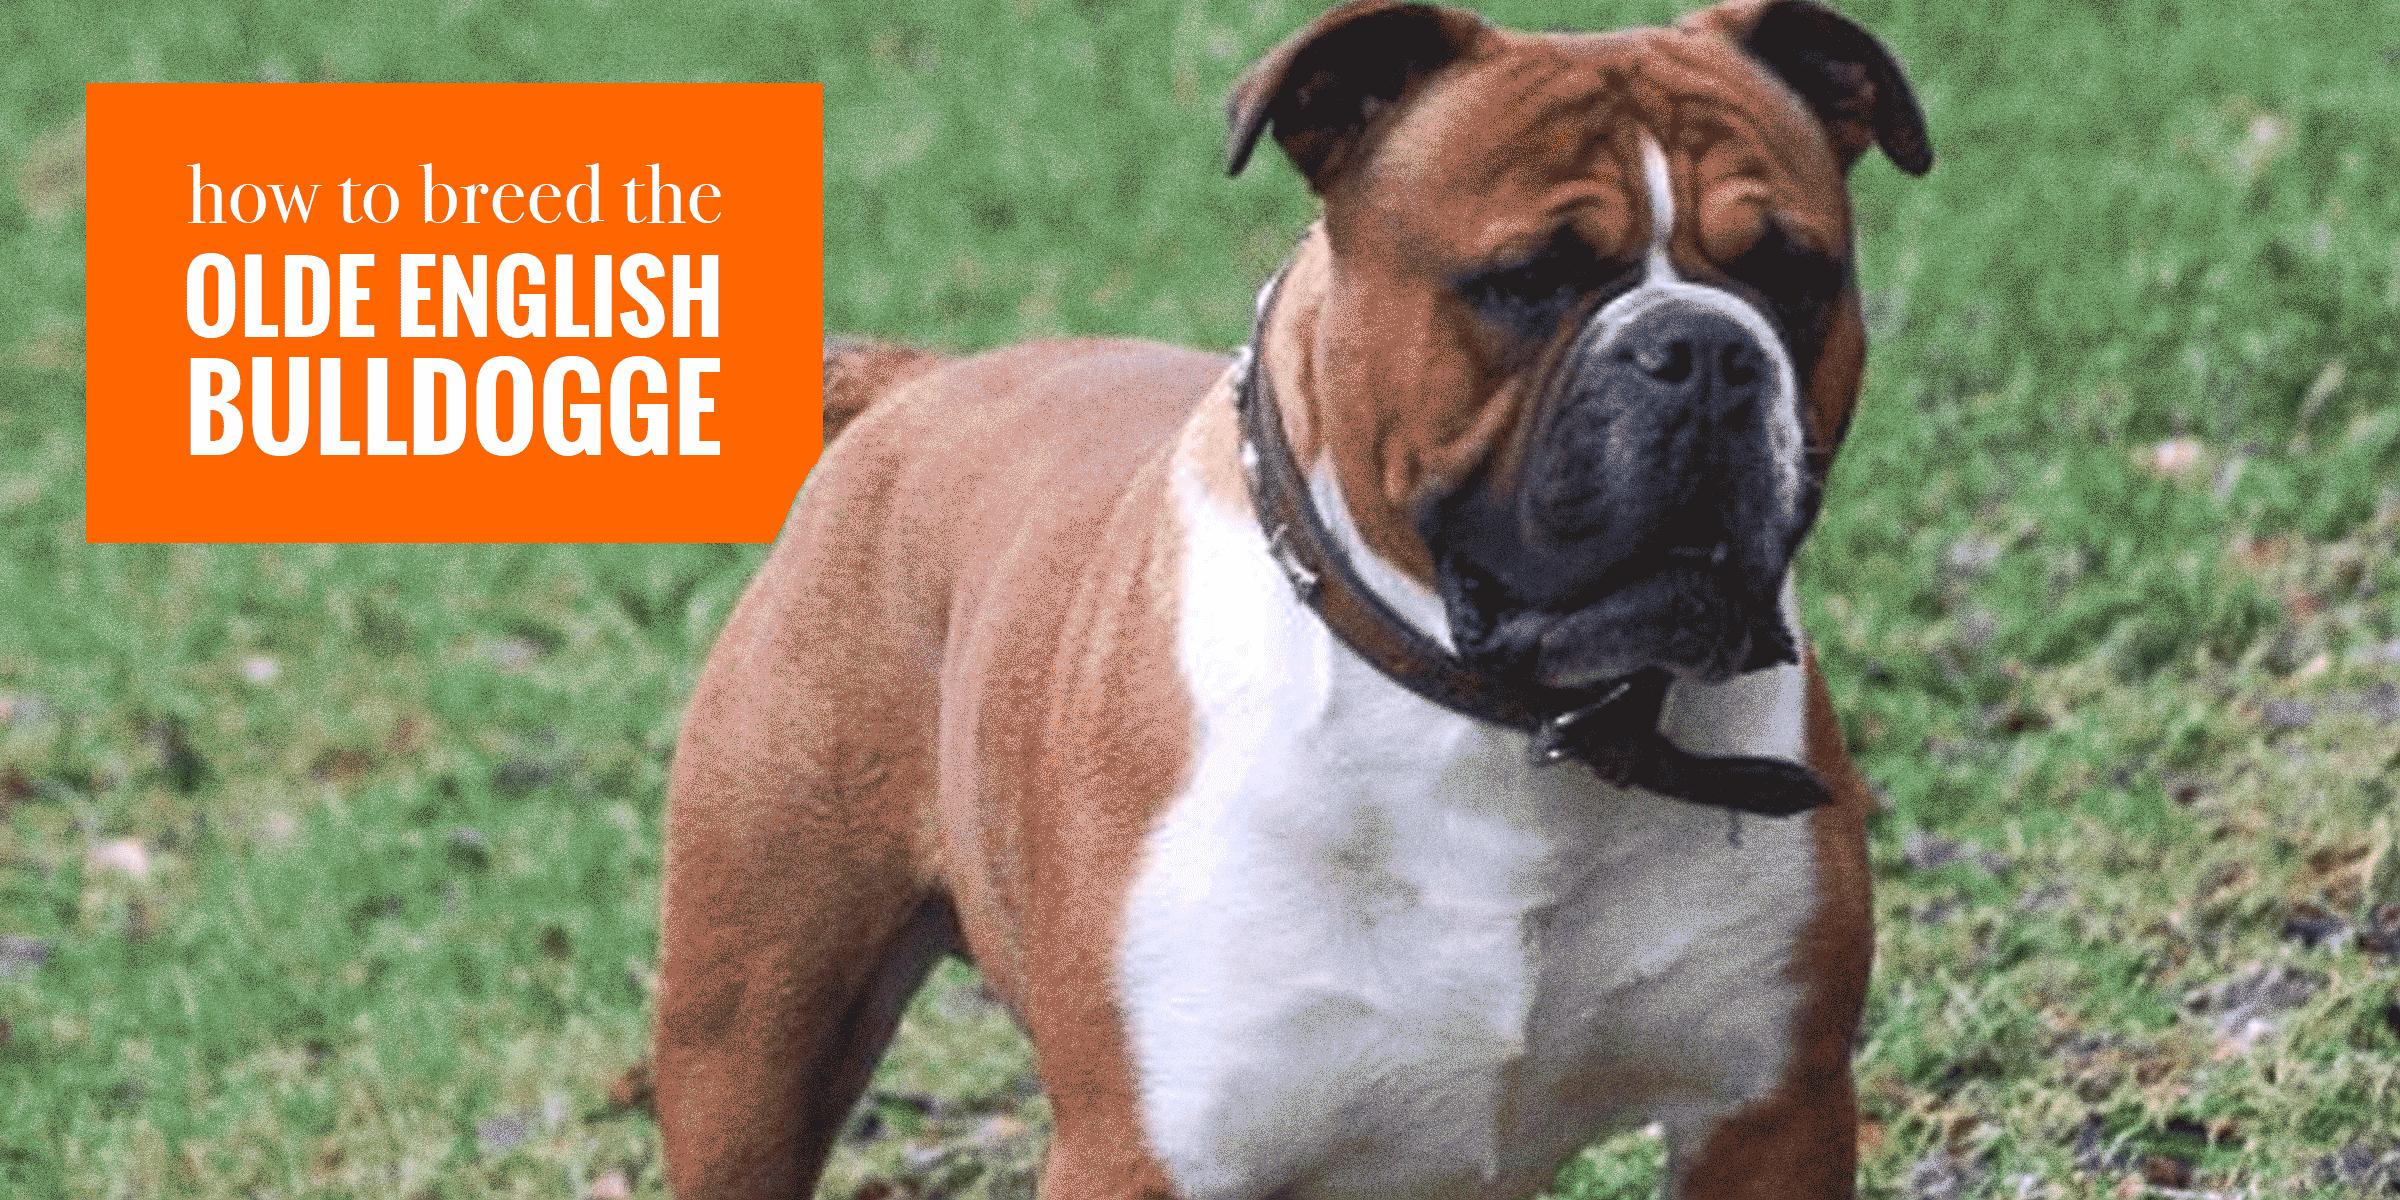 Breeding Olde English Bulldogge Dogs Health Litter Management